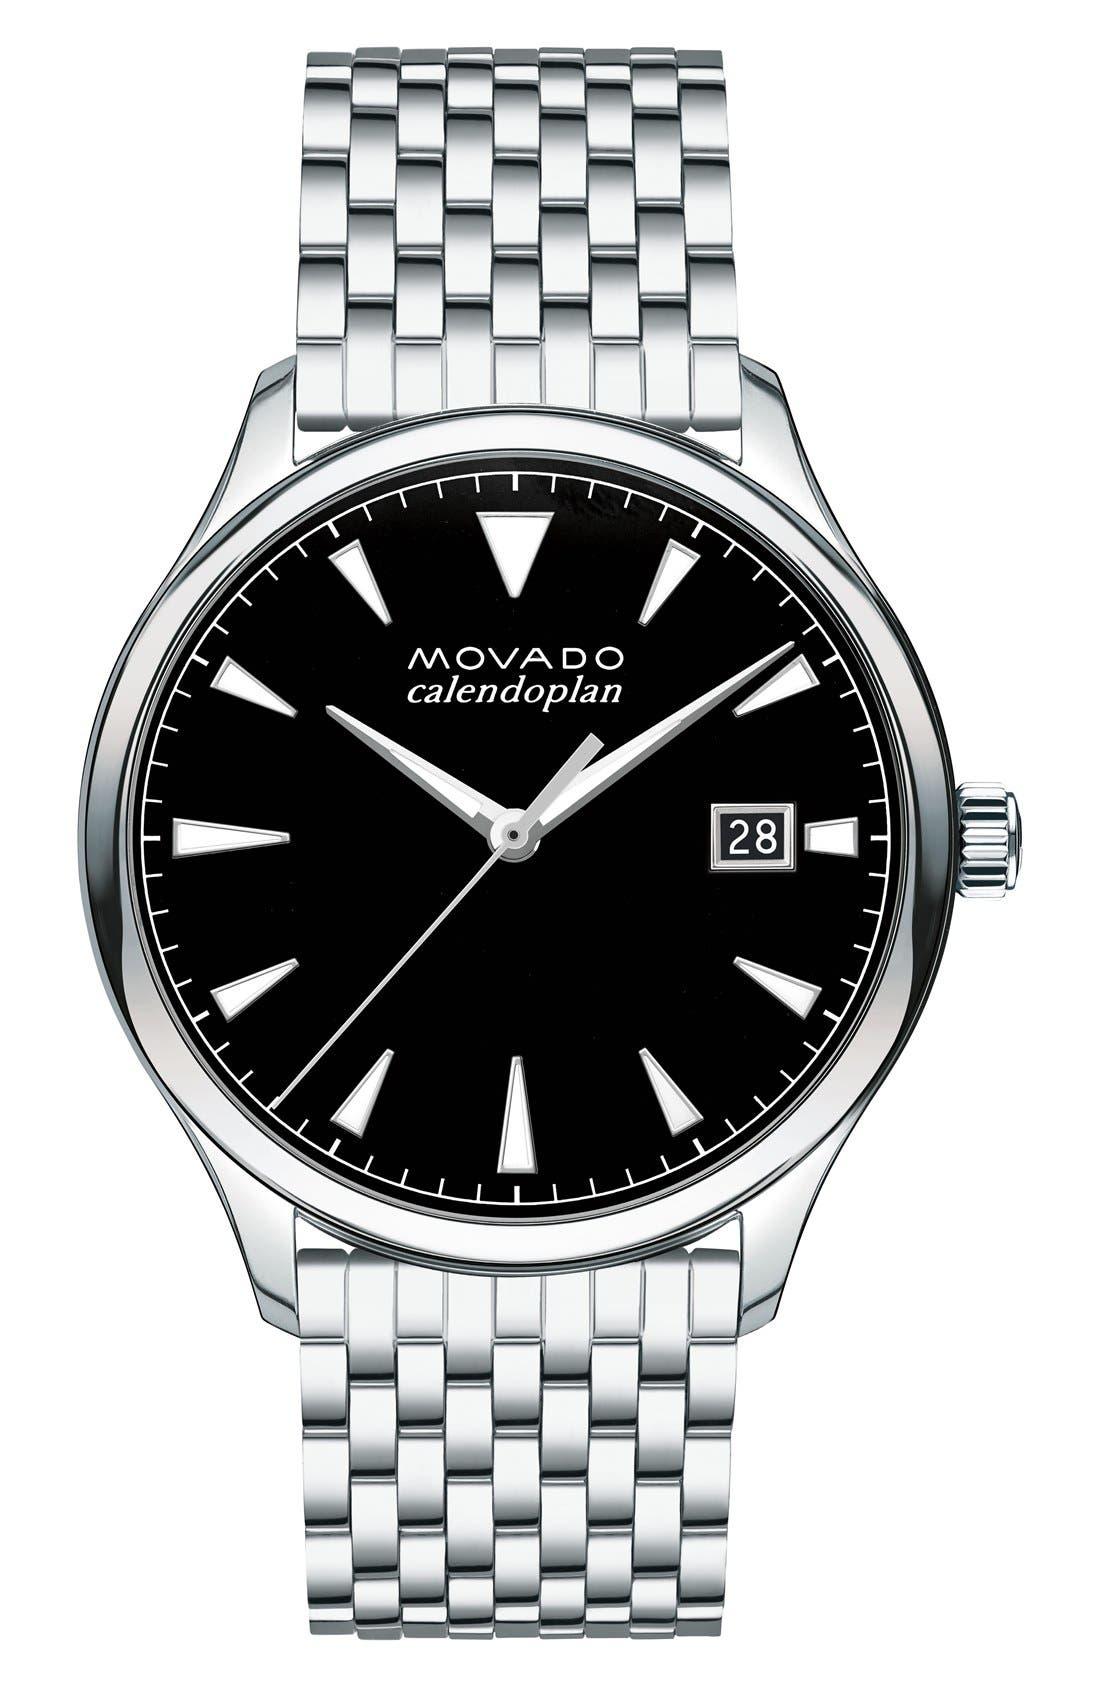 MOVADO Heritage Calendoplan Bracelet Watch, 40mm